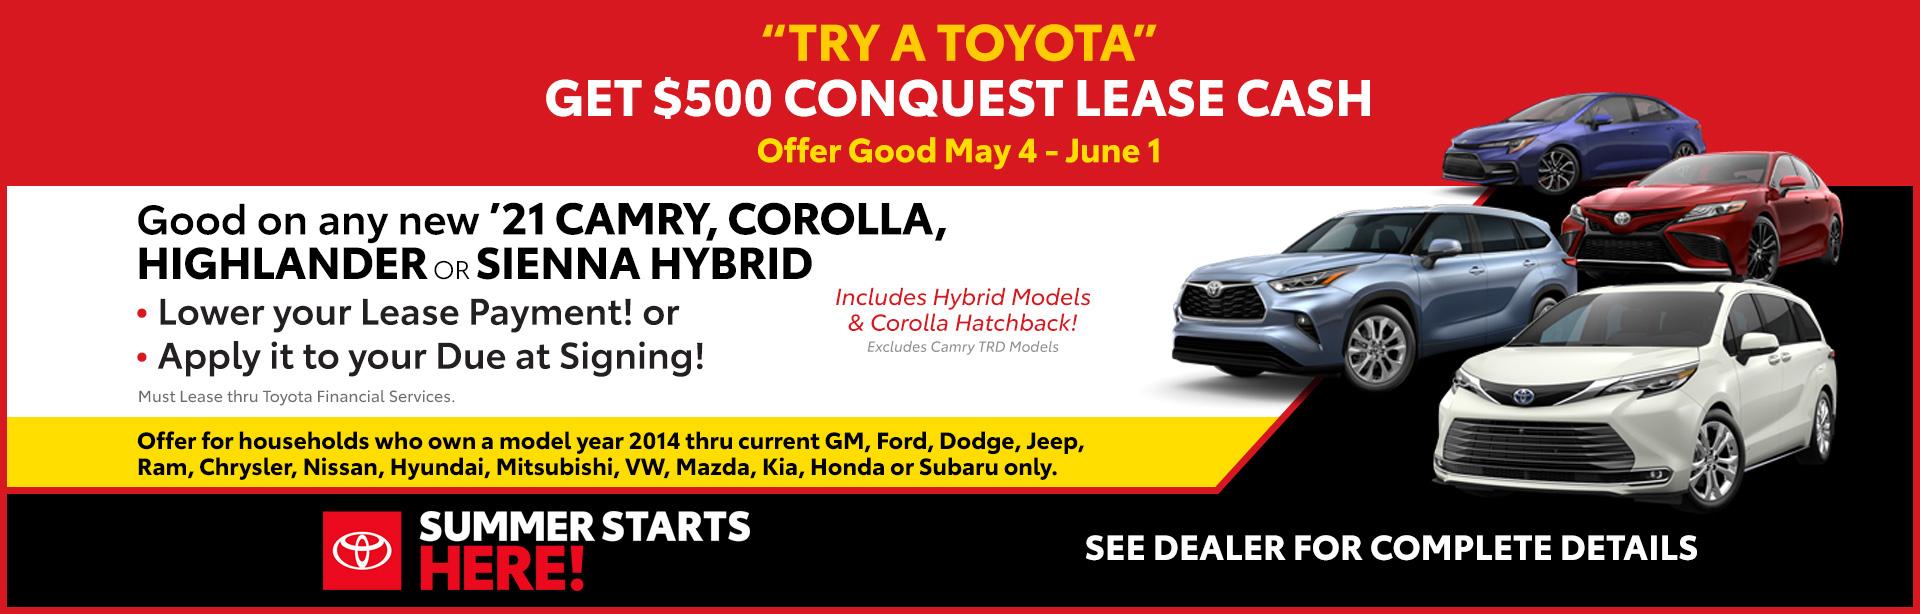 05-21_01_Cincinnati-May-2021-CIN-Conquest-Lease-Cash_1920x614_0eaf_Camry-Camry-Hybrid-Corolla-Corolla-Hatchback-Corolla-Hybrid-Highlander-Hybrid-Highlander-Sienna_O_xta.jpeg